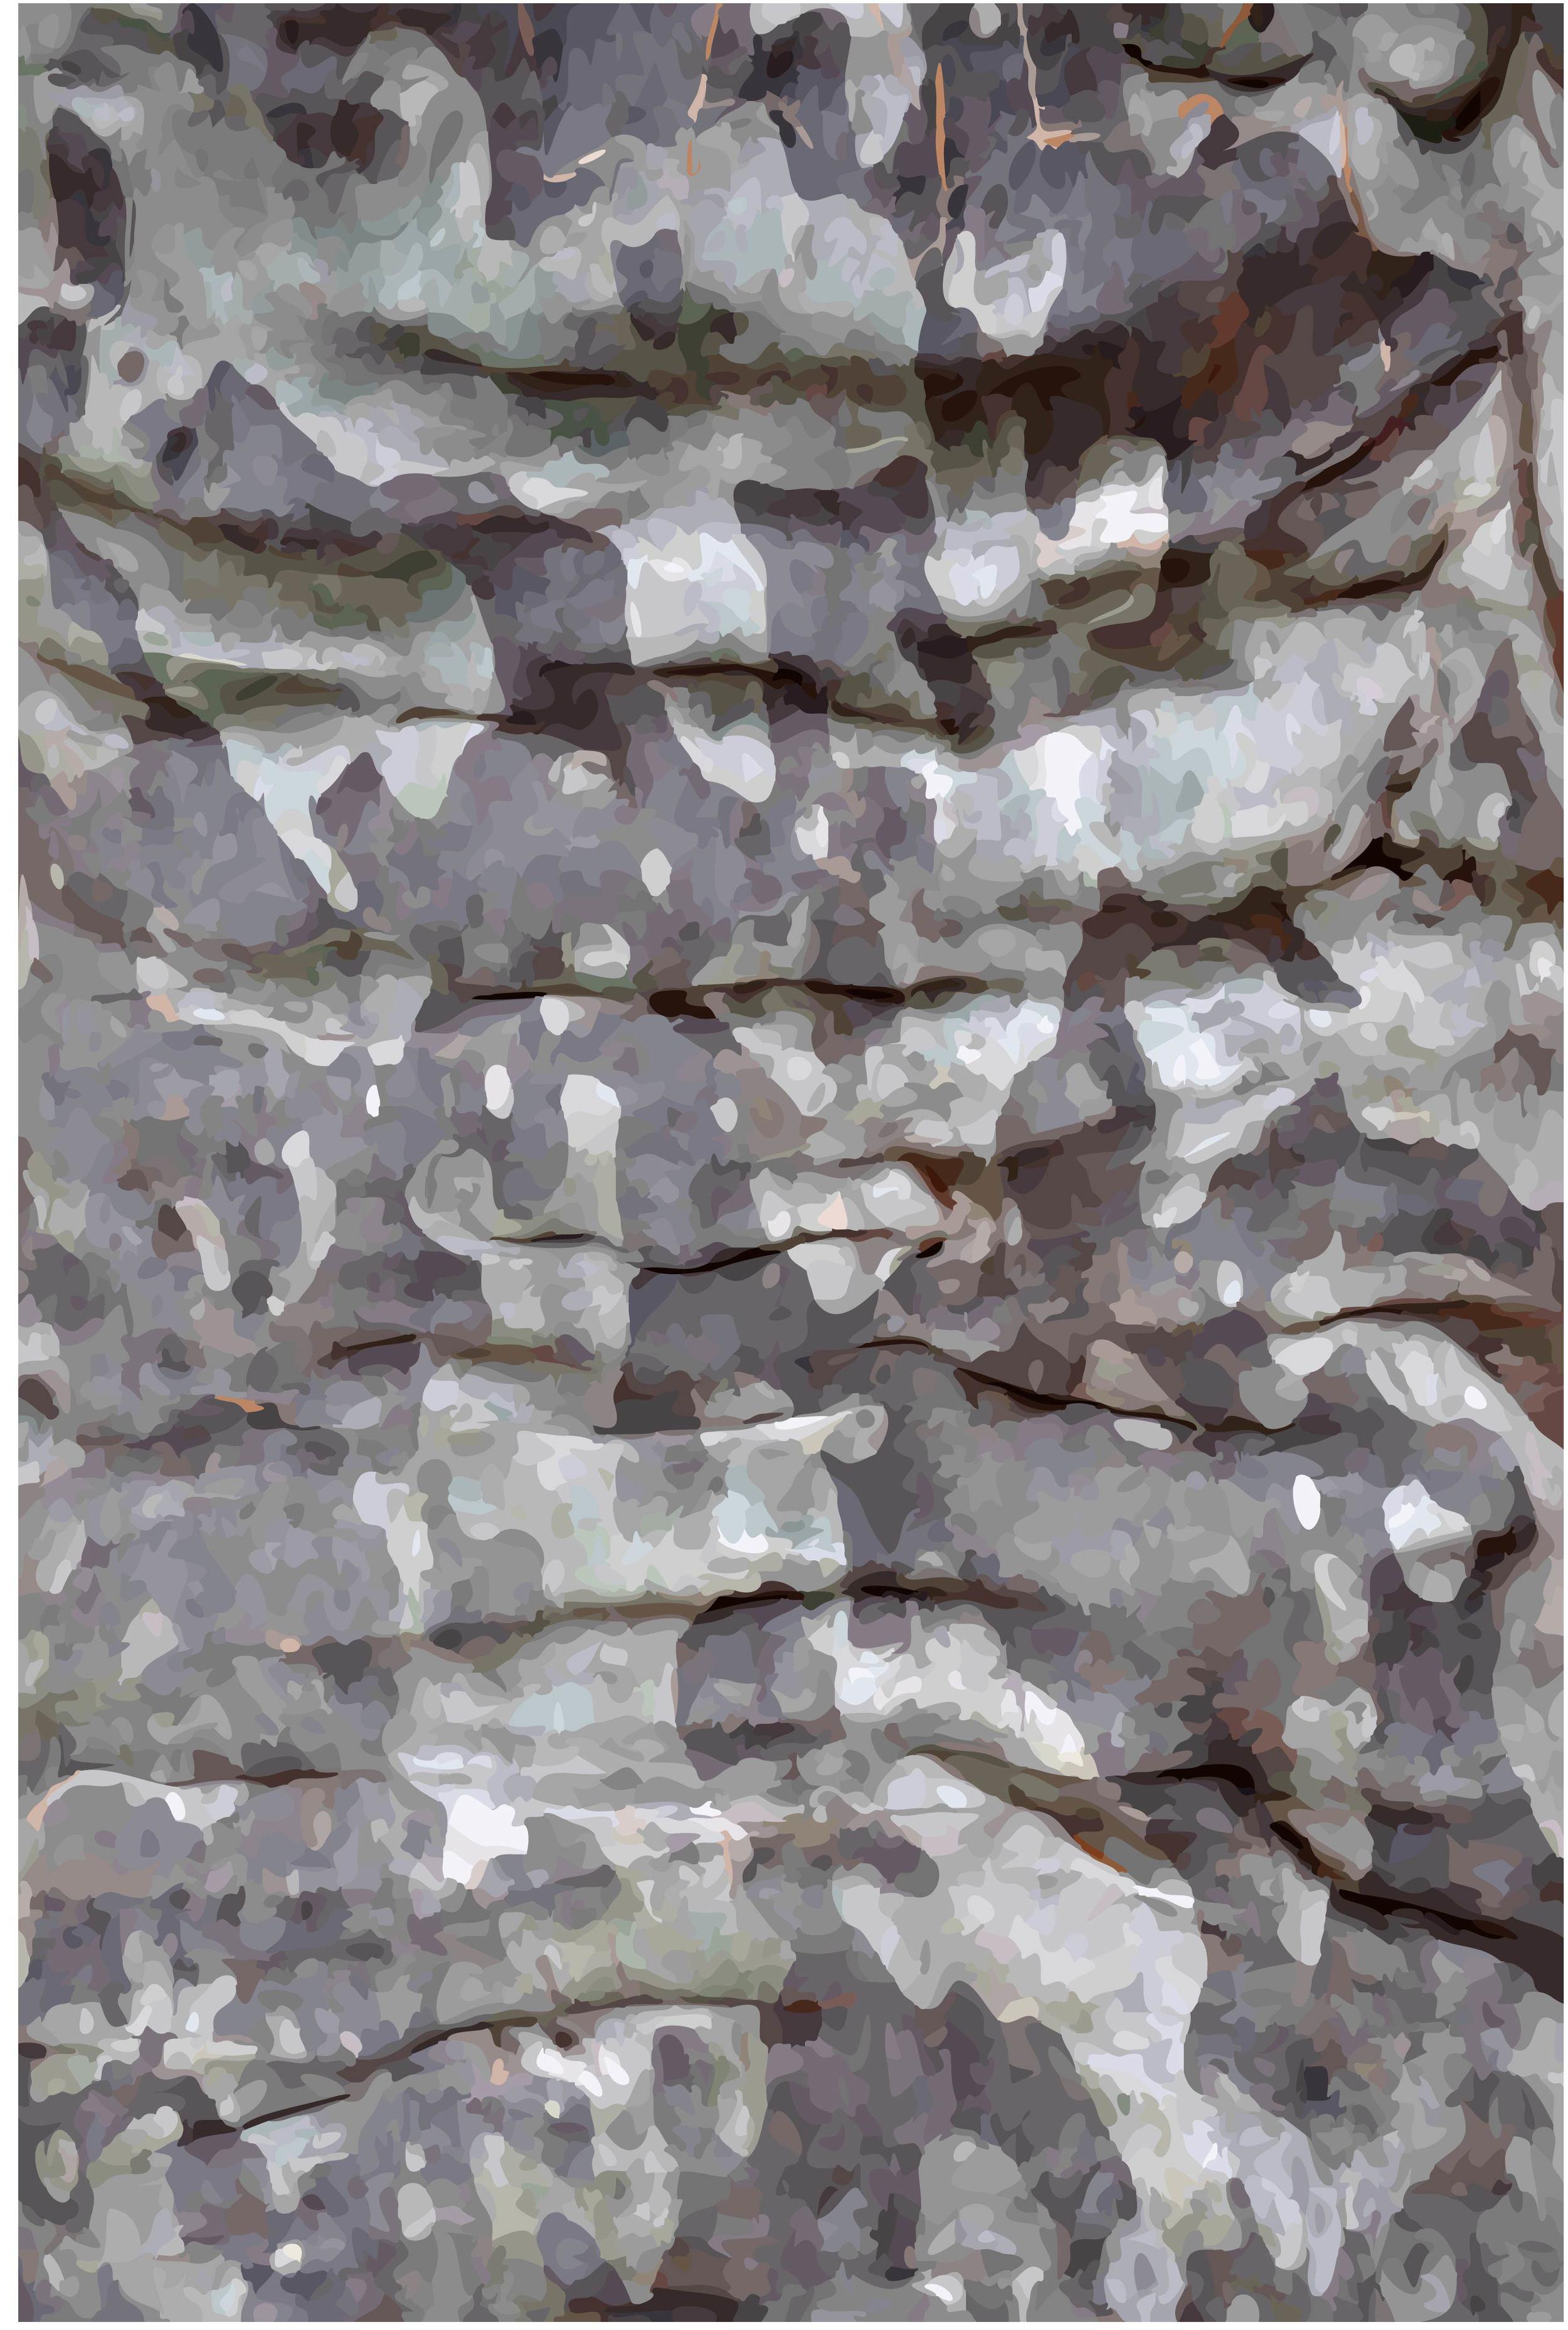 Maculata (Old Blotchy) #1